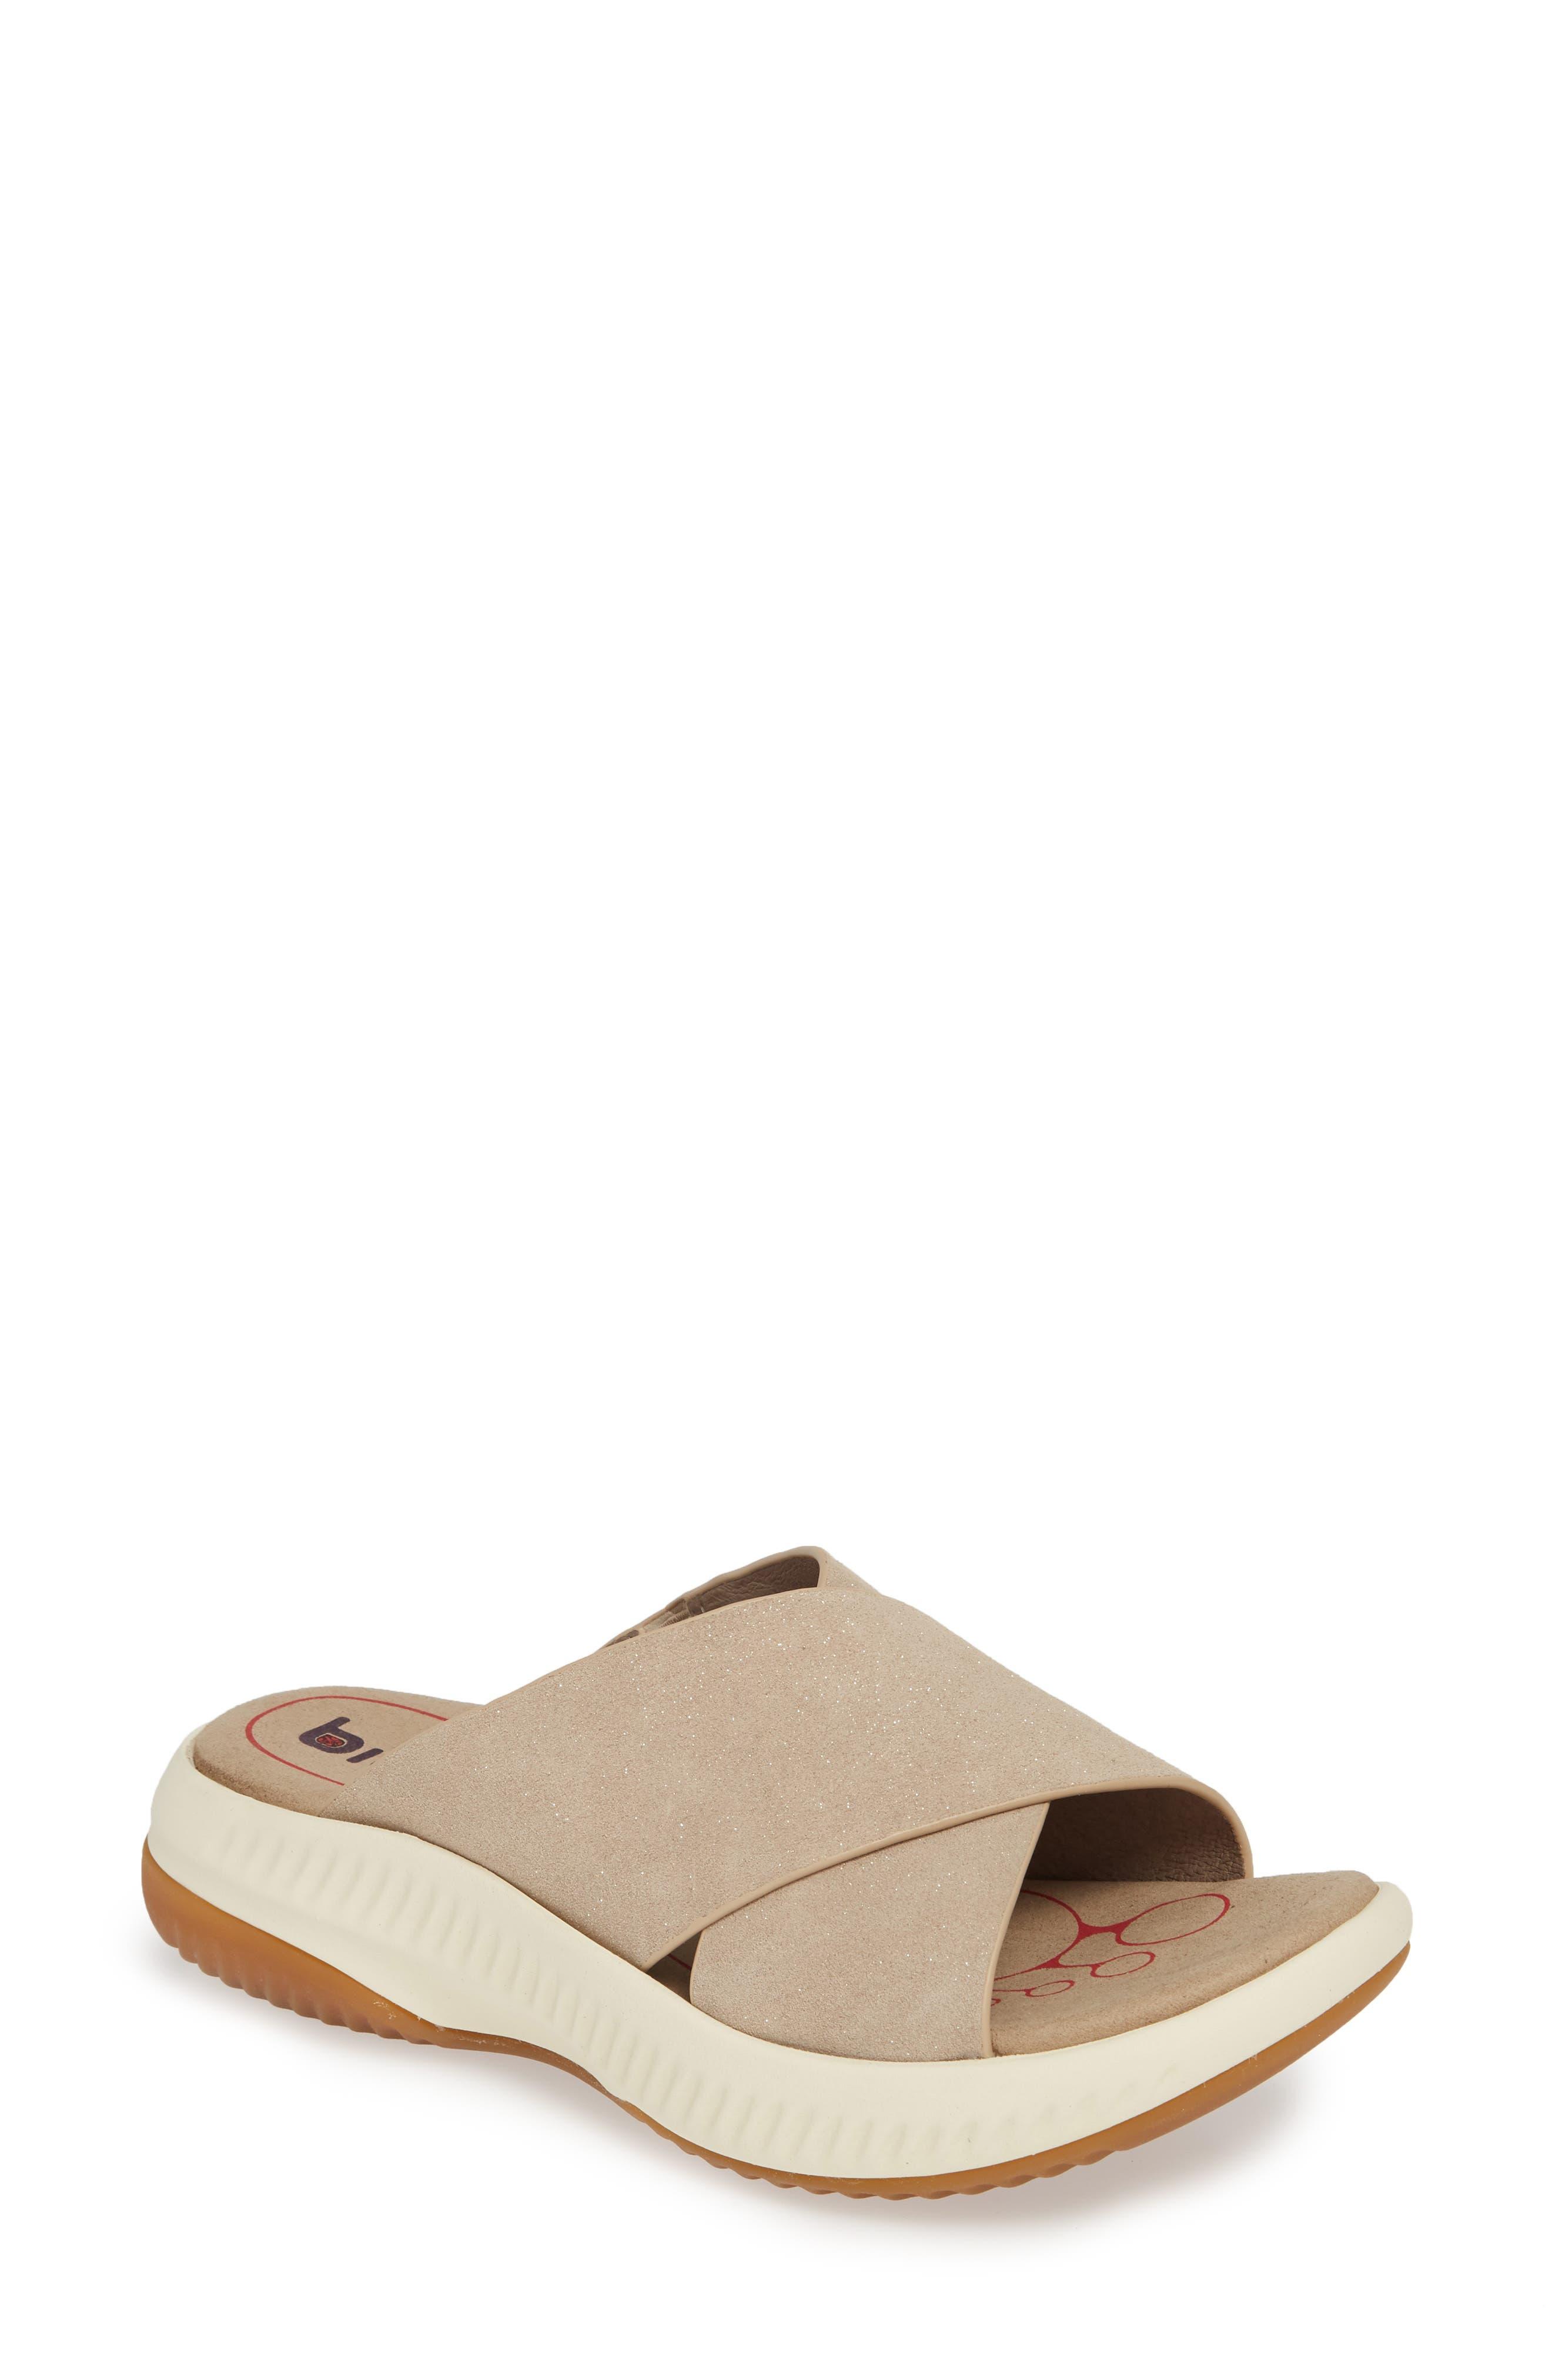 Bionica Ambridge Slide Sandal, Grey